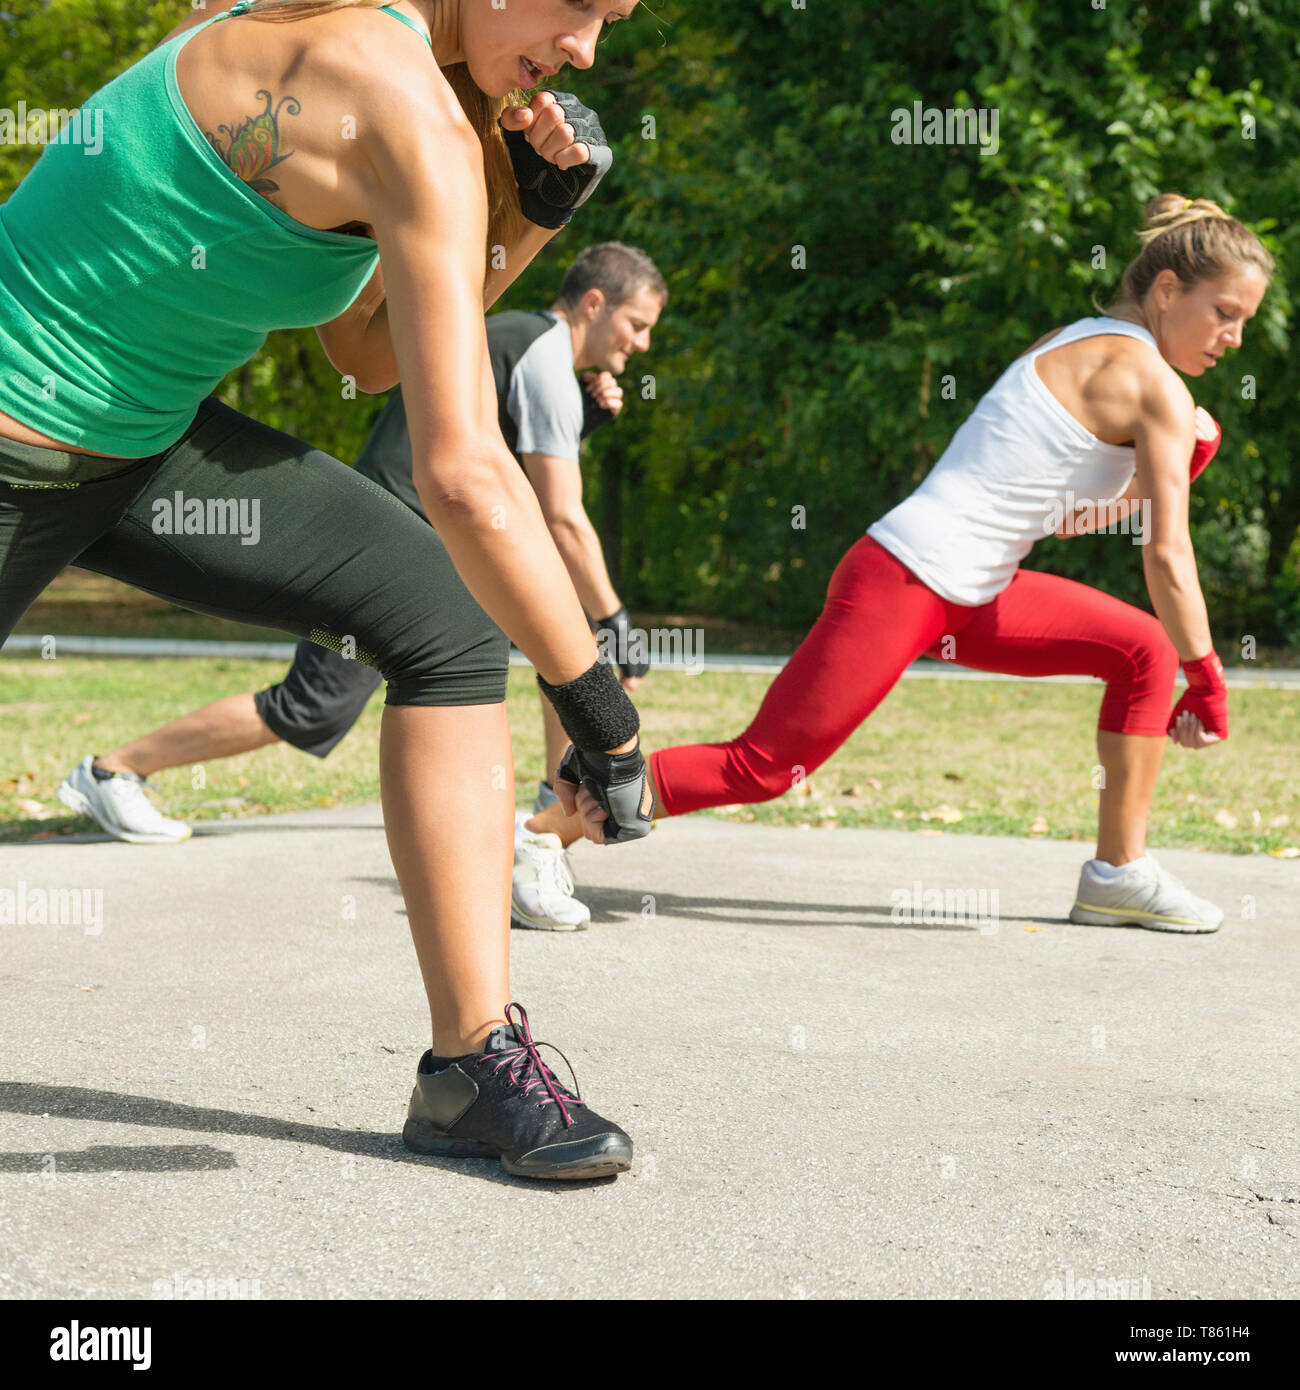 Kickboxing training outdoors - Stock Image